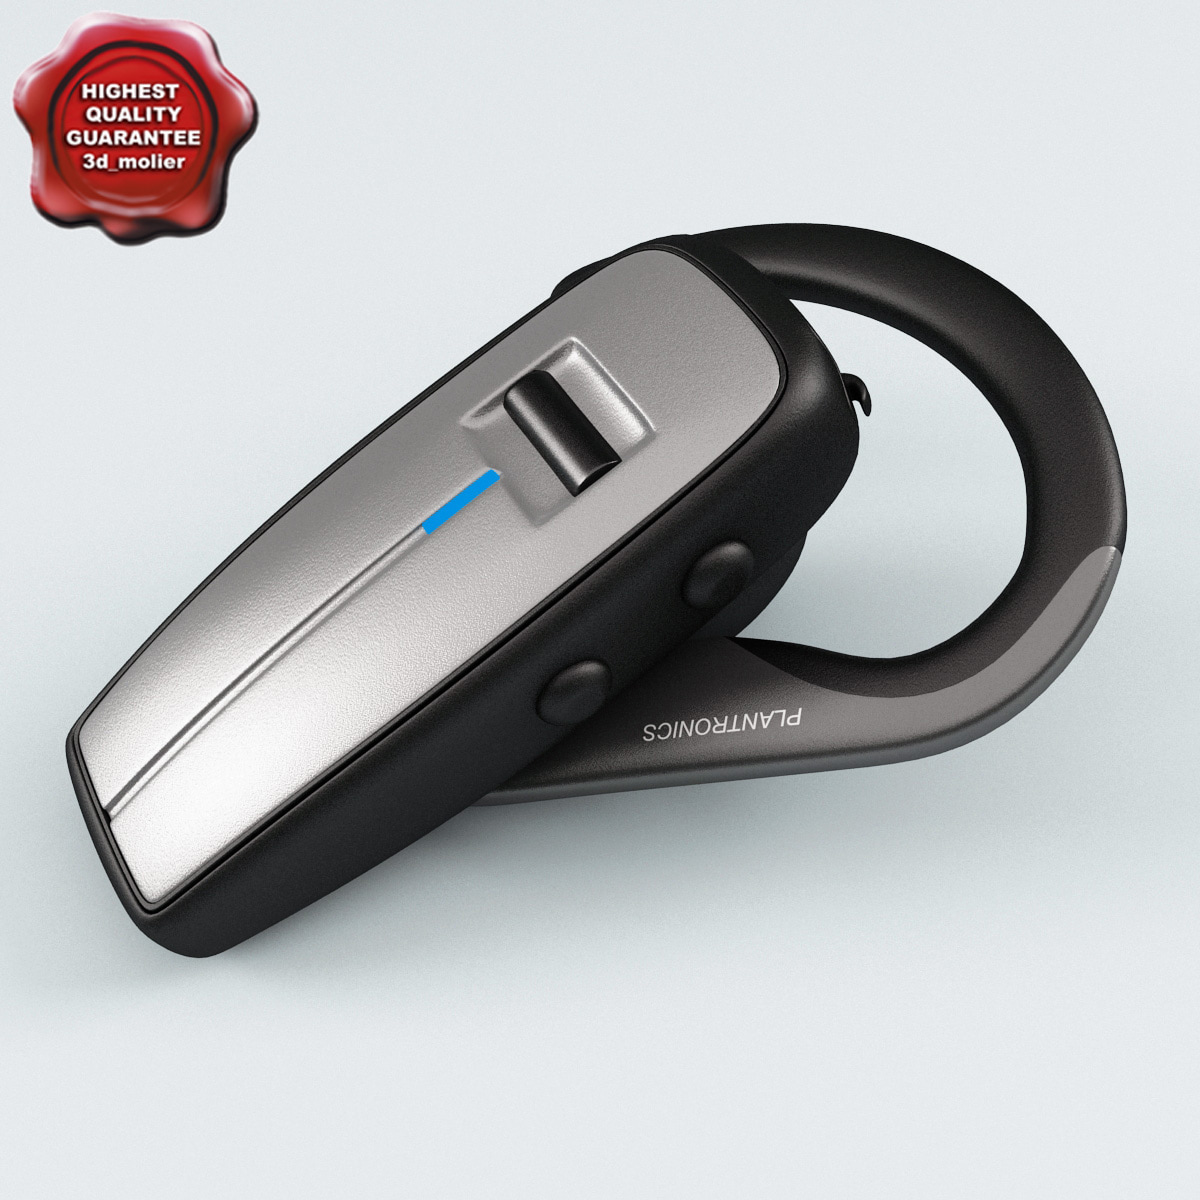 Ruggedized_Bluetooth_Headset_Plantronics_Explorer_370_00.jpg